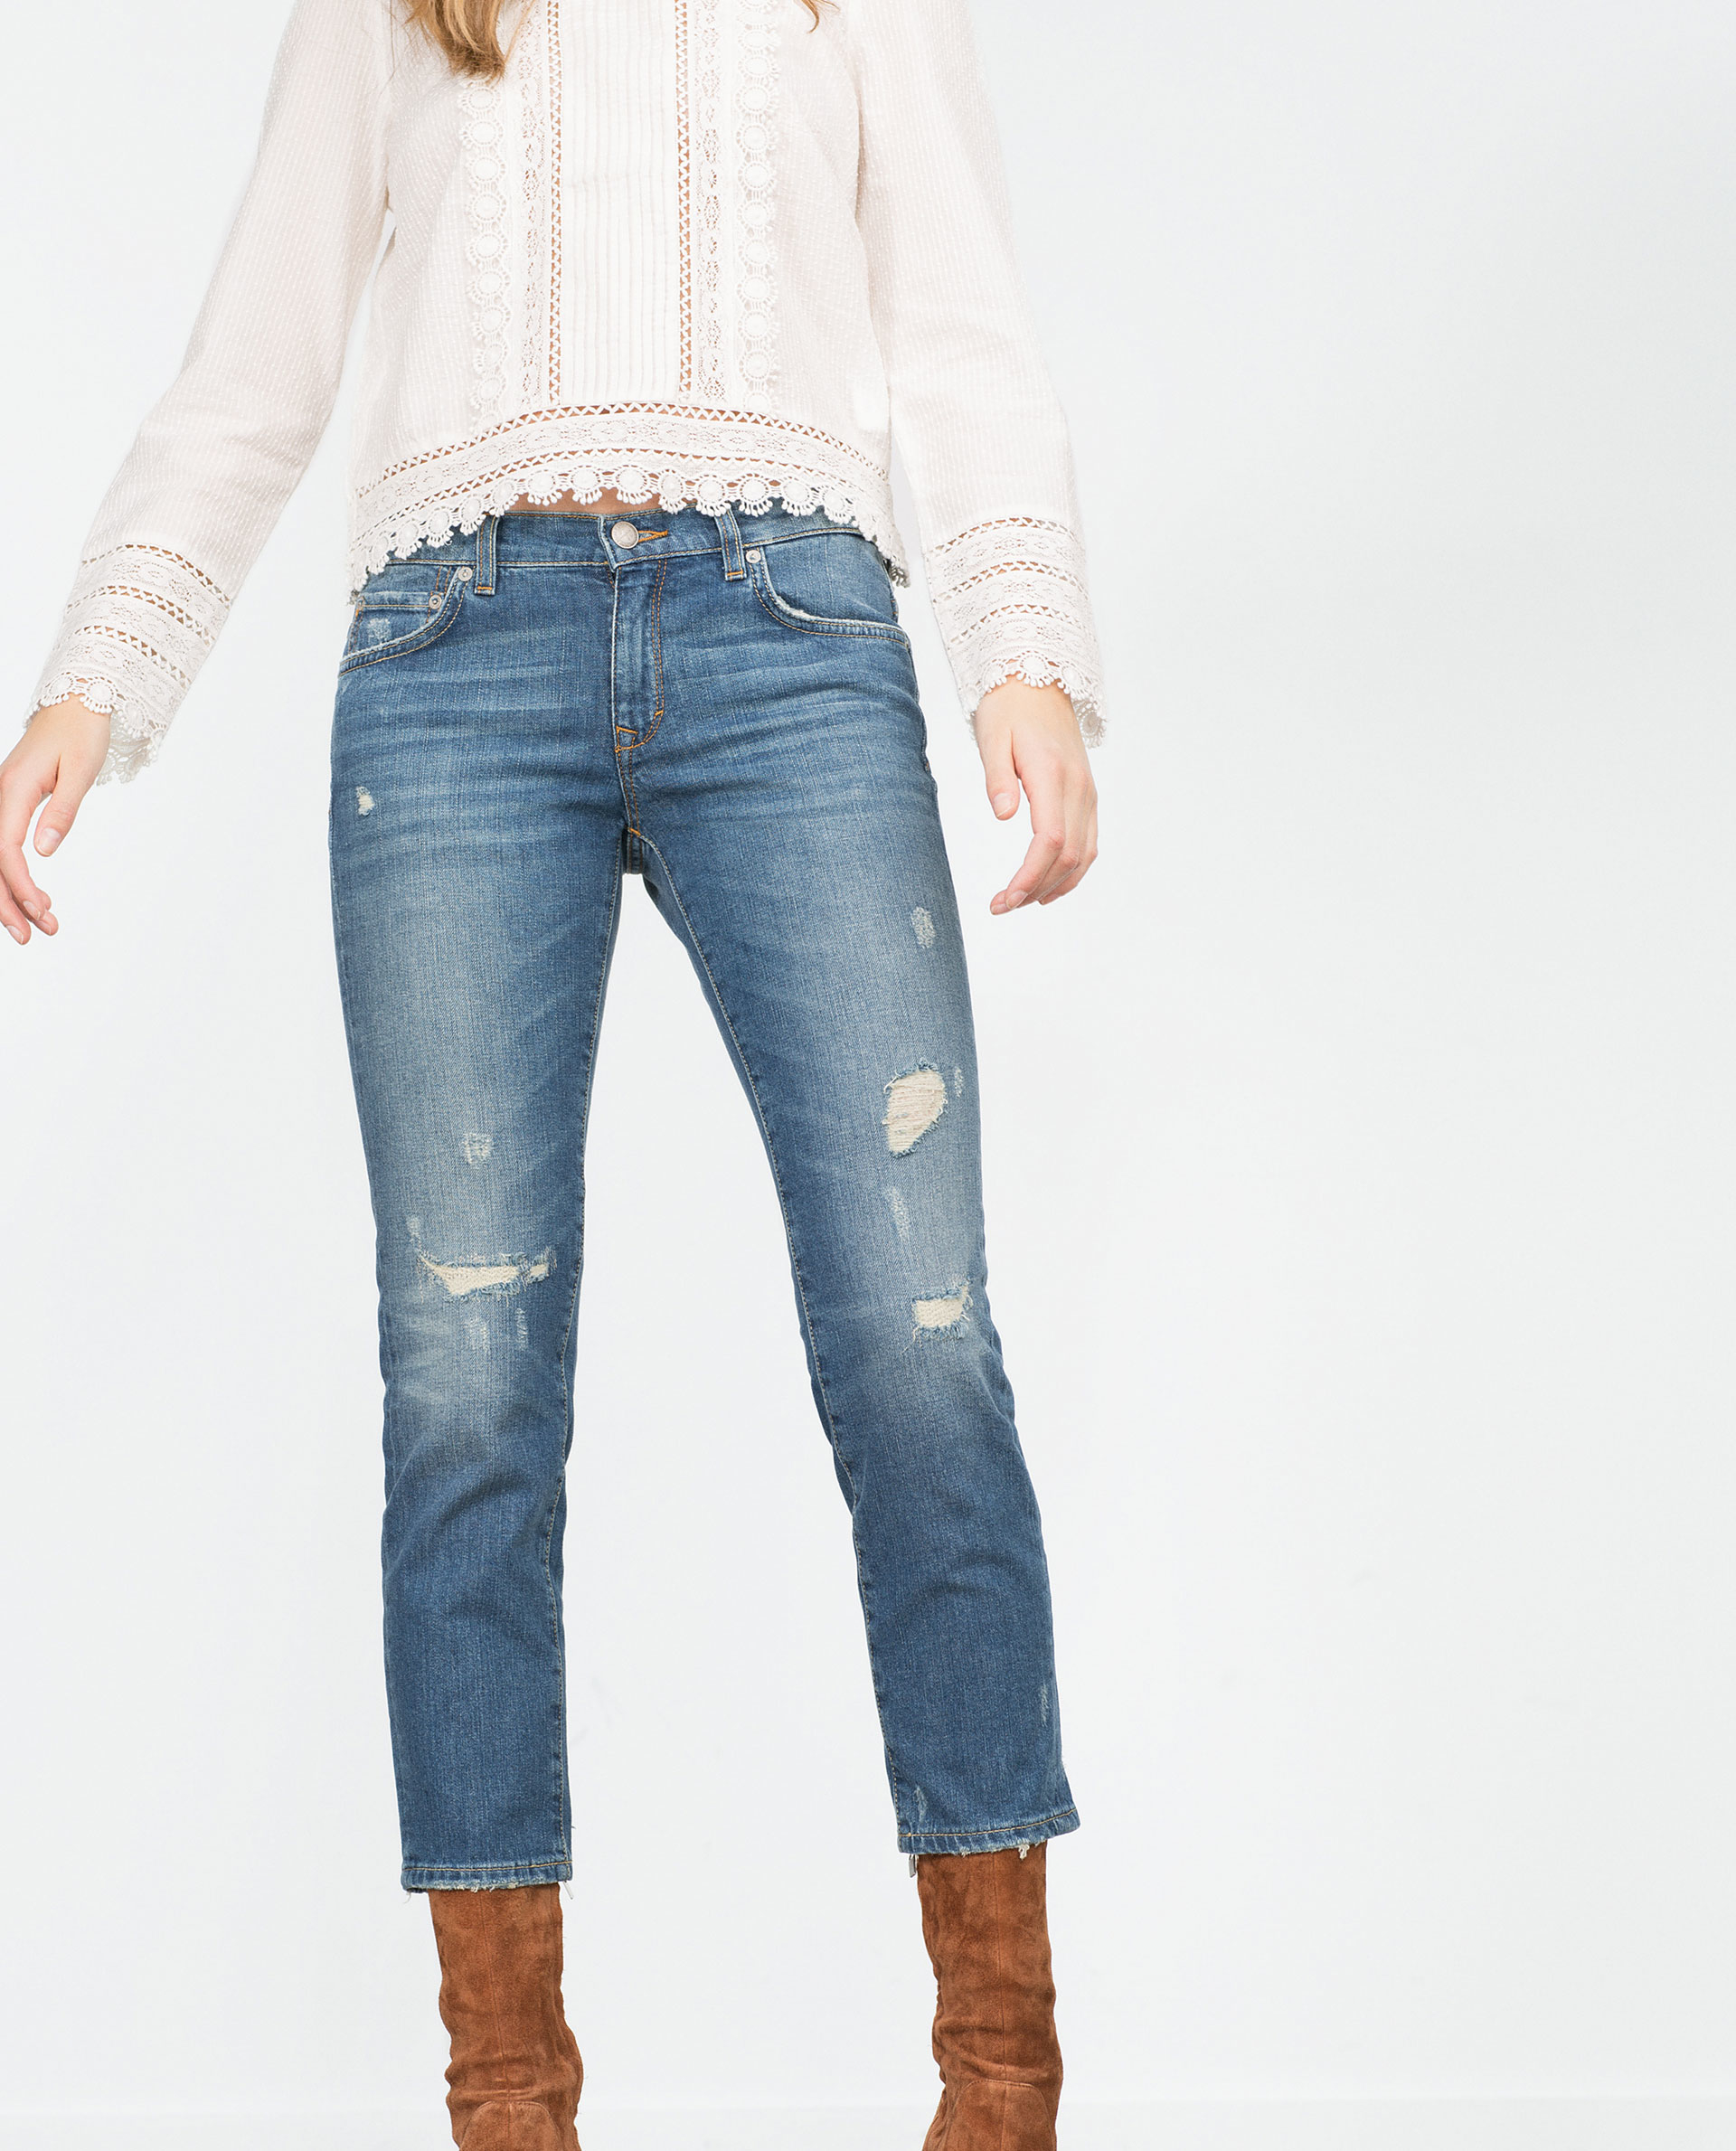 Zara Mid-rise Cigarette Jeans in Blue | Lyst